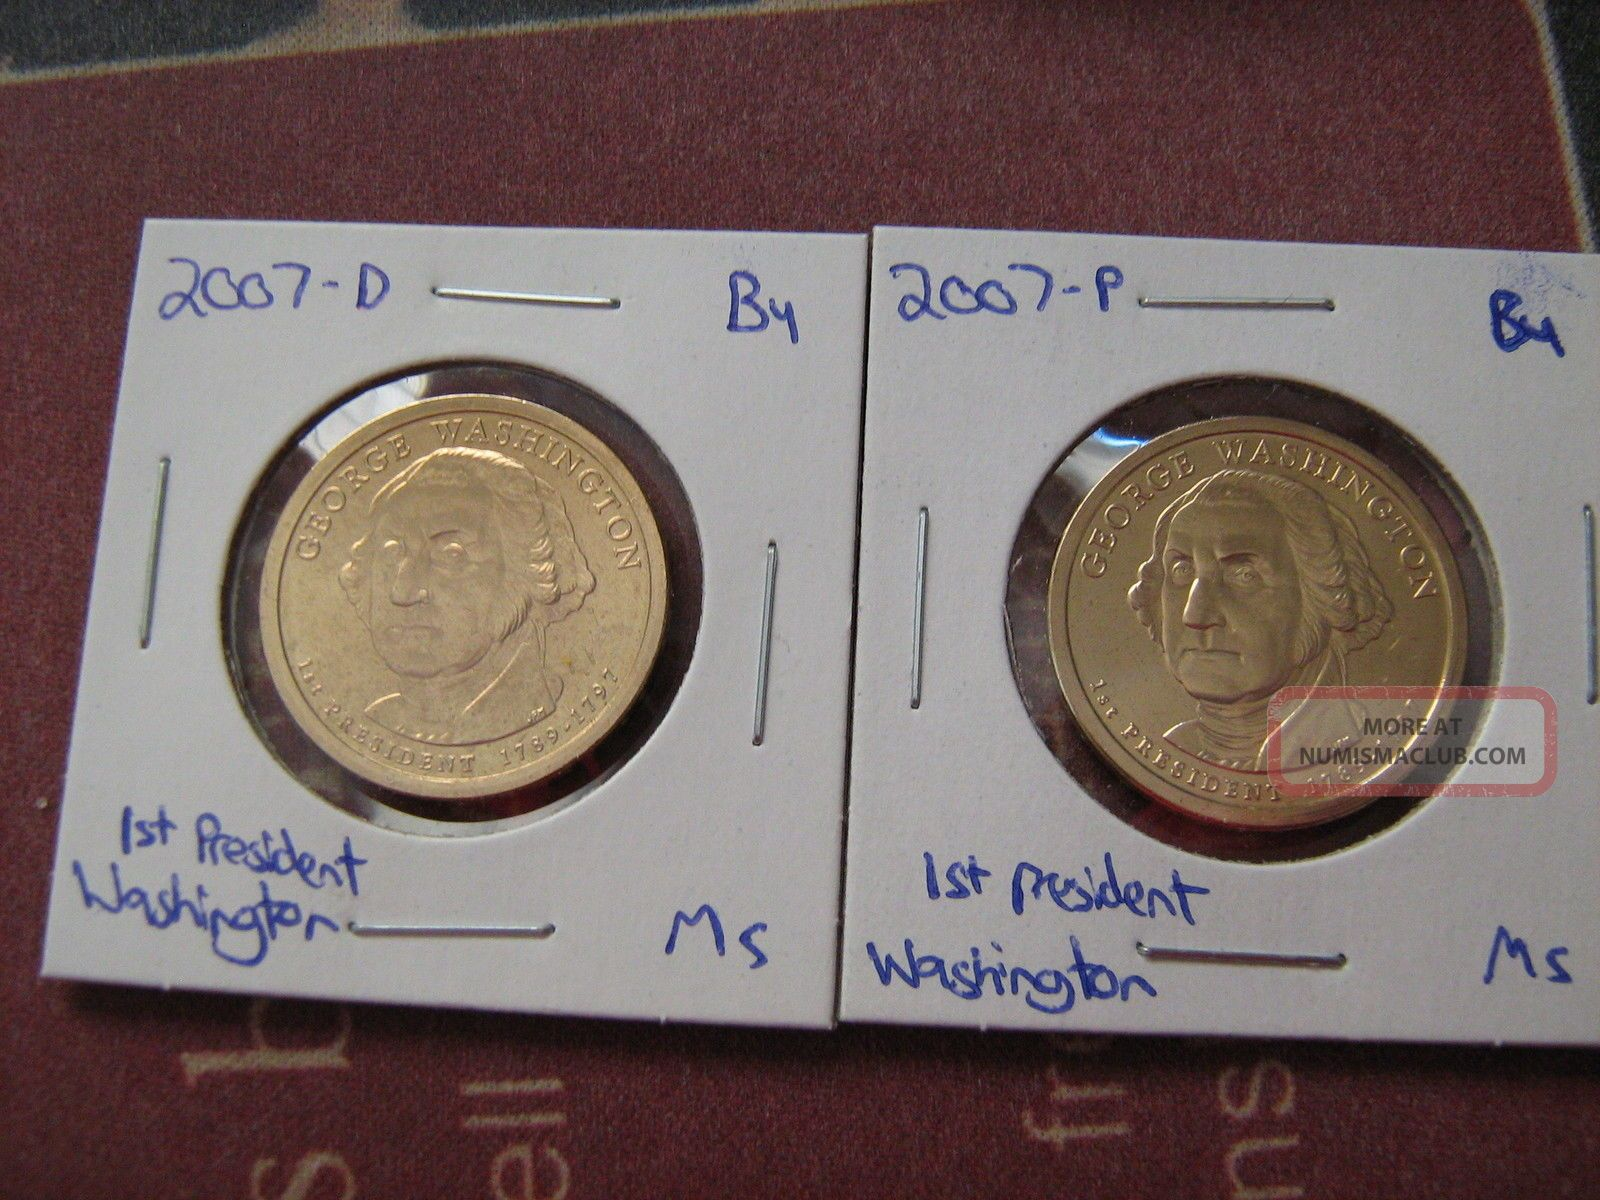 2007 - Pd 1st President George Washington Satin Finish Golden Dollars Dollars photo